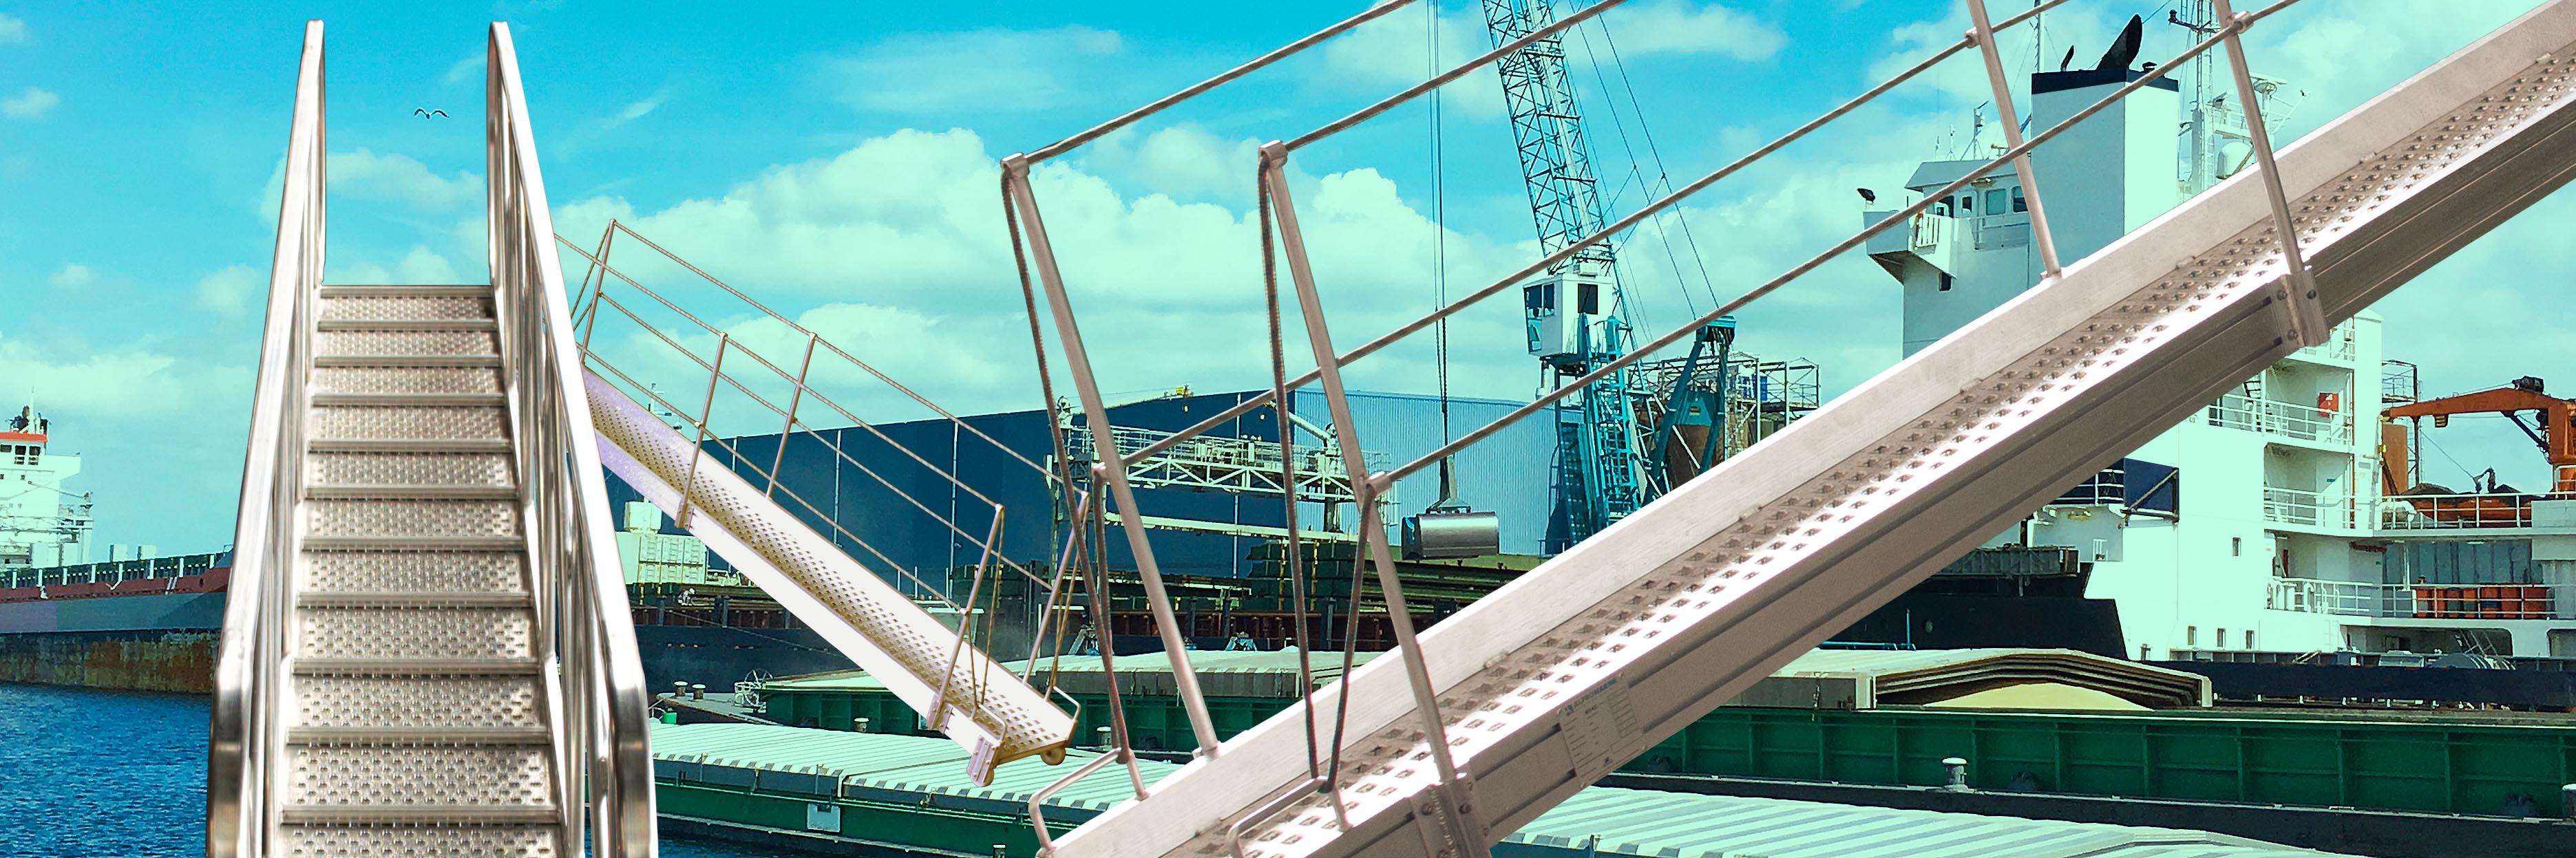 Products4Ships aluminium gangways